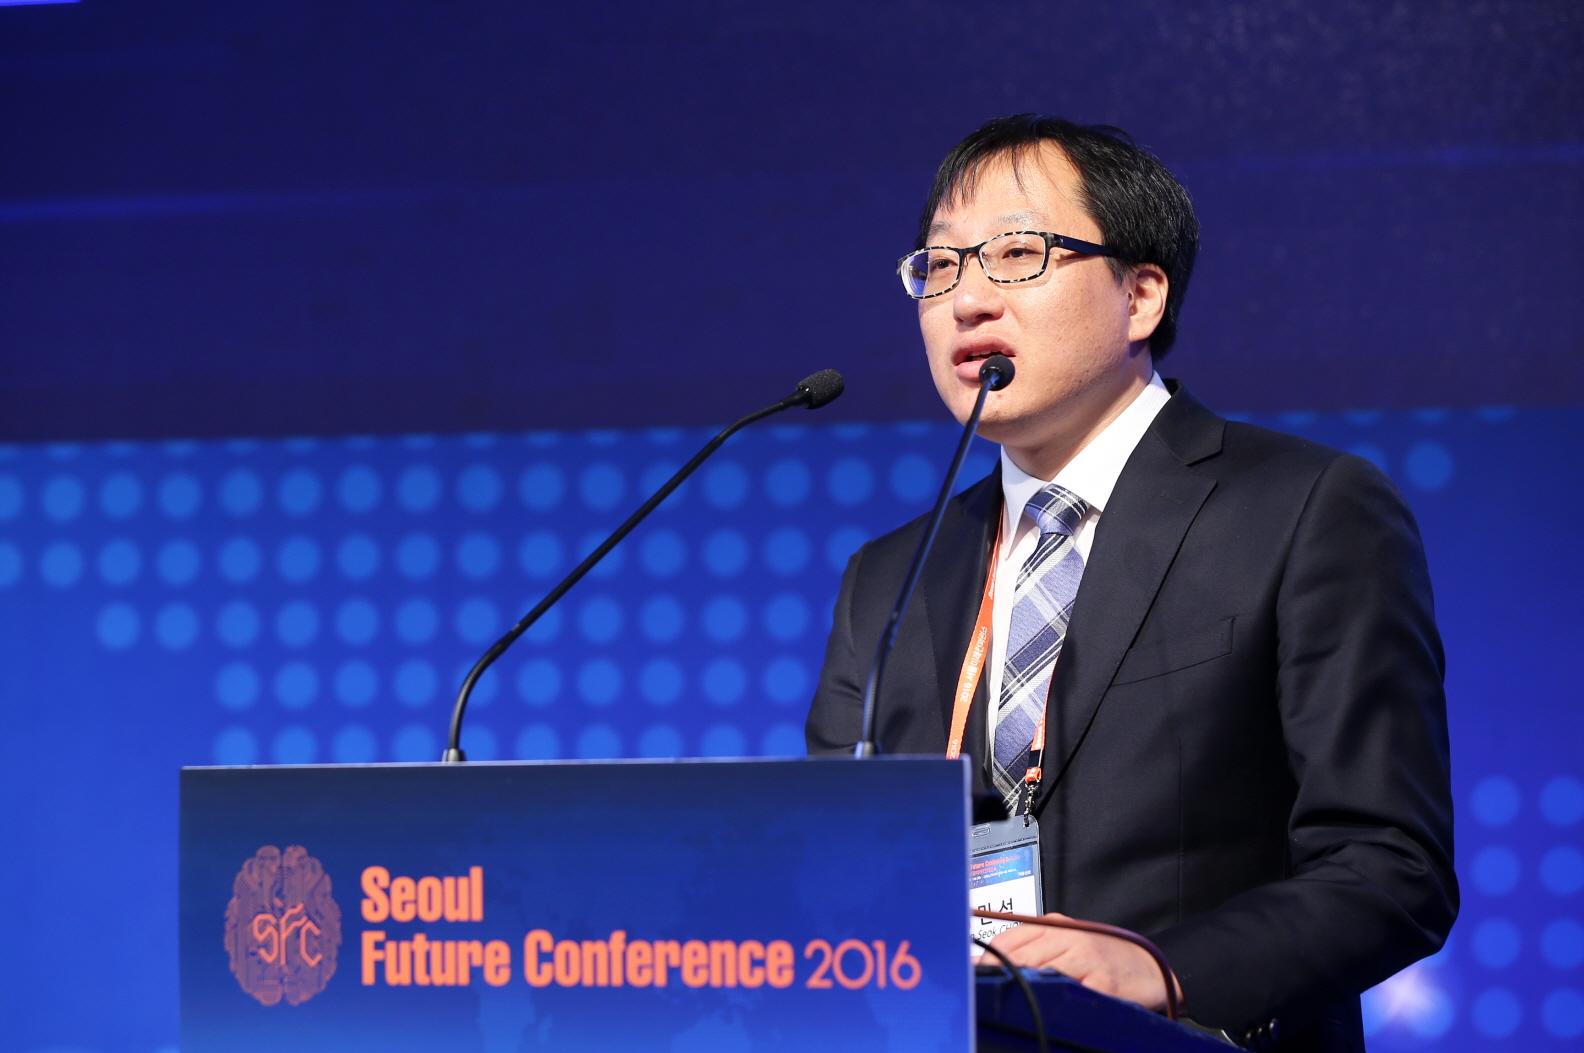 2016 SFC Session I 최민석 한국전자통신연구원 미래사회연구실장